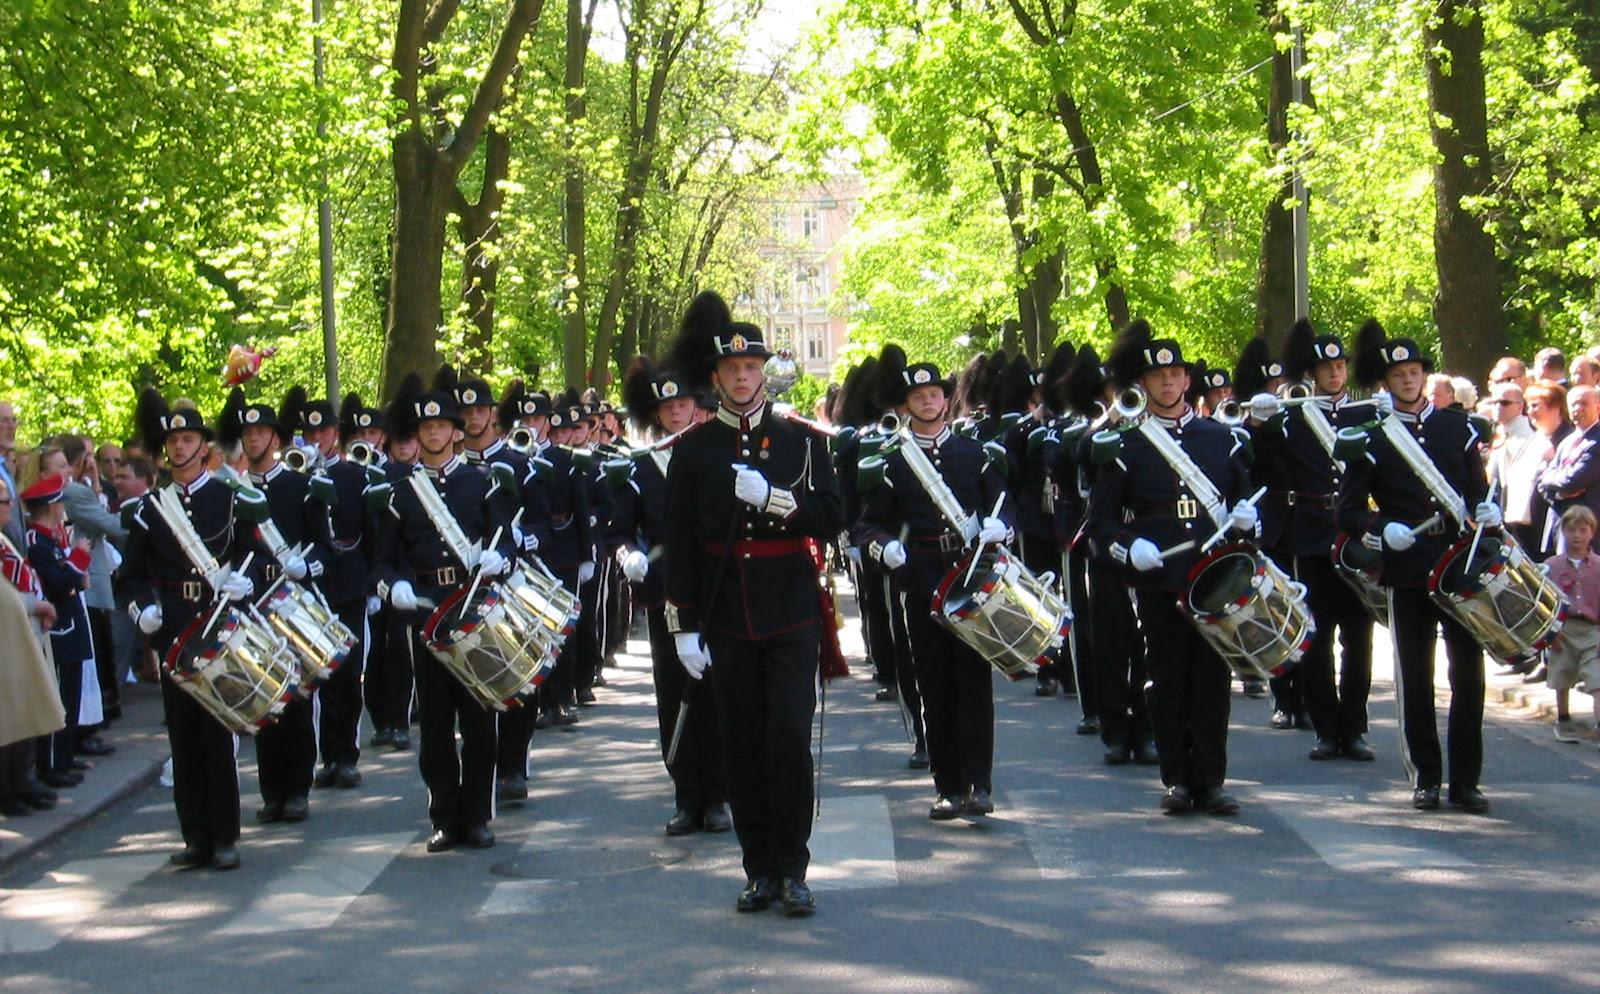 The Royal Norwegian Guard (Hans Majestet Kongens Garde)